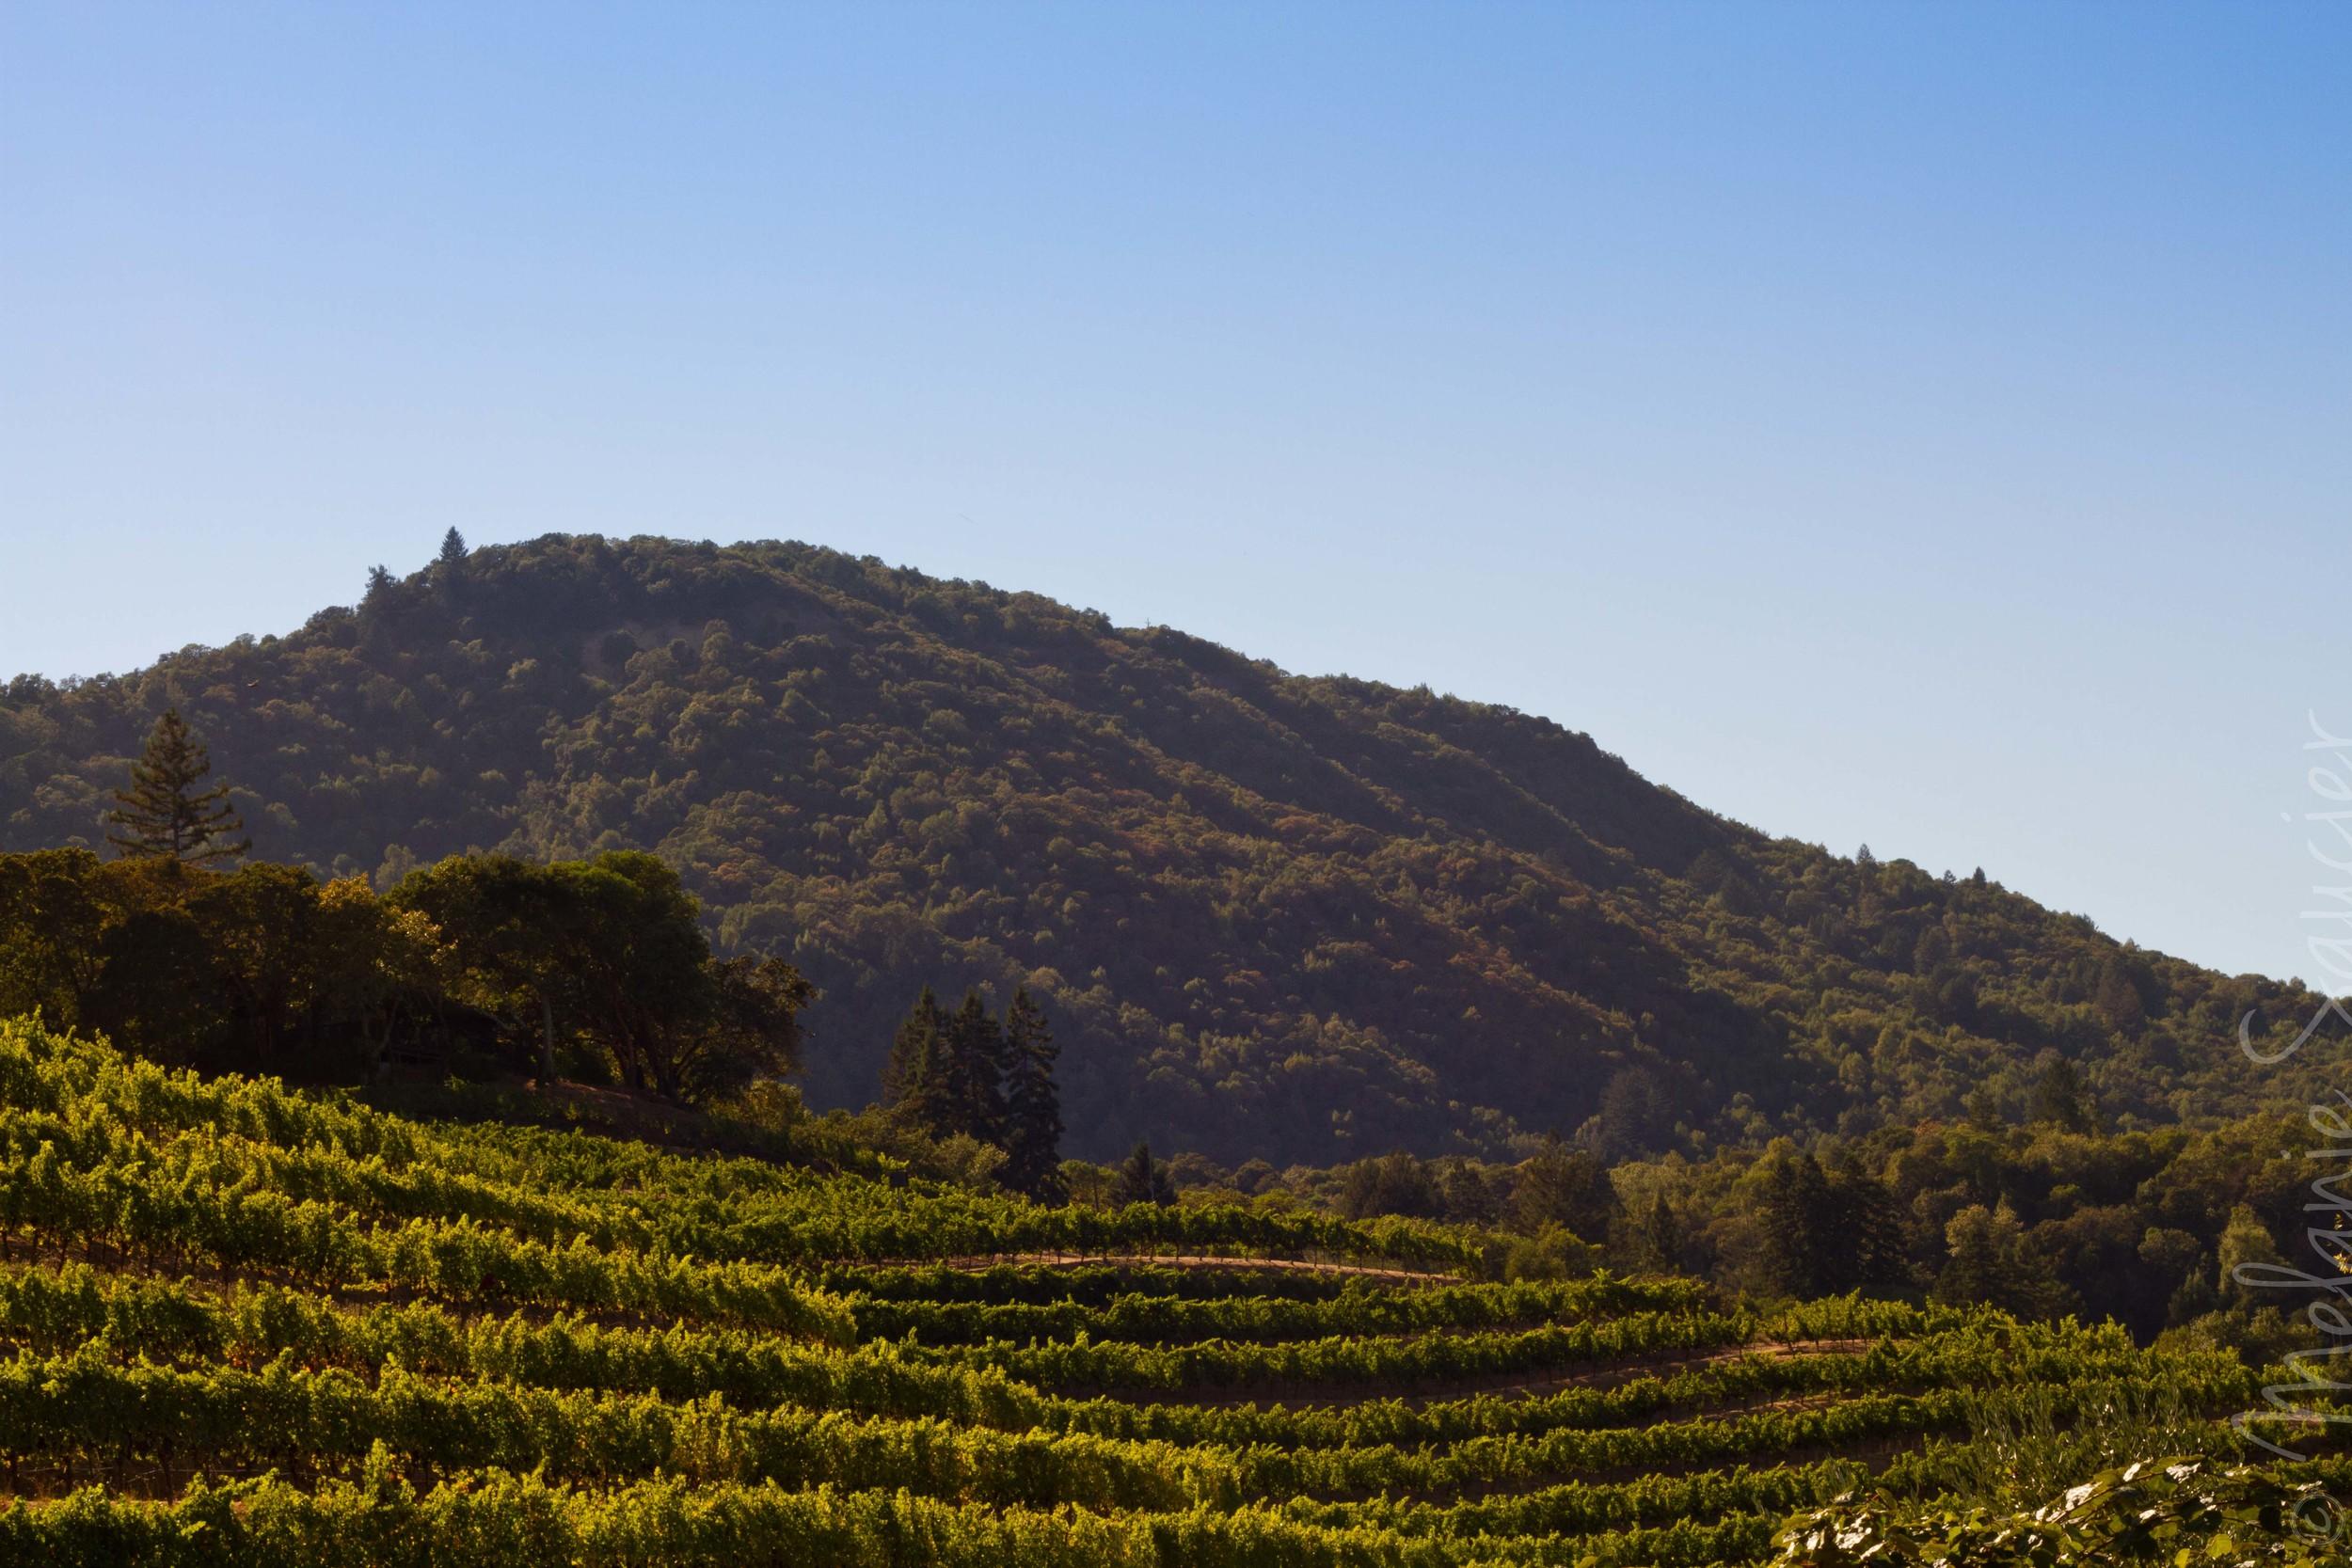 Benziger Winery